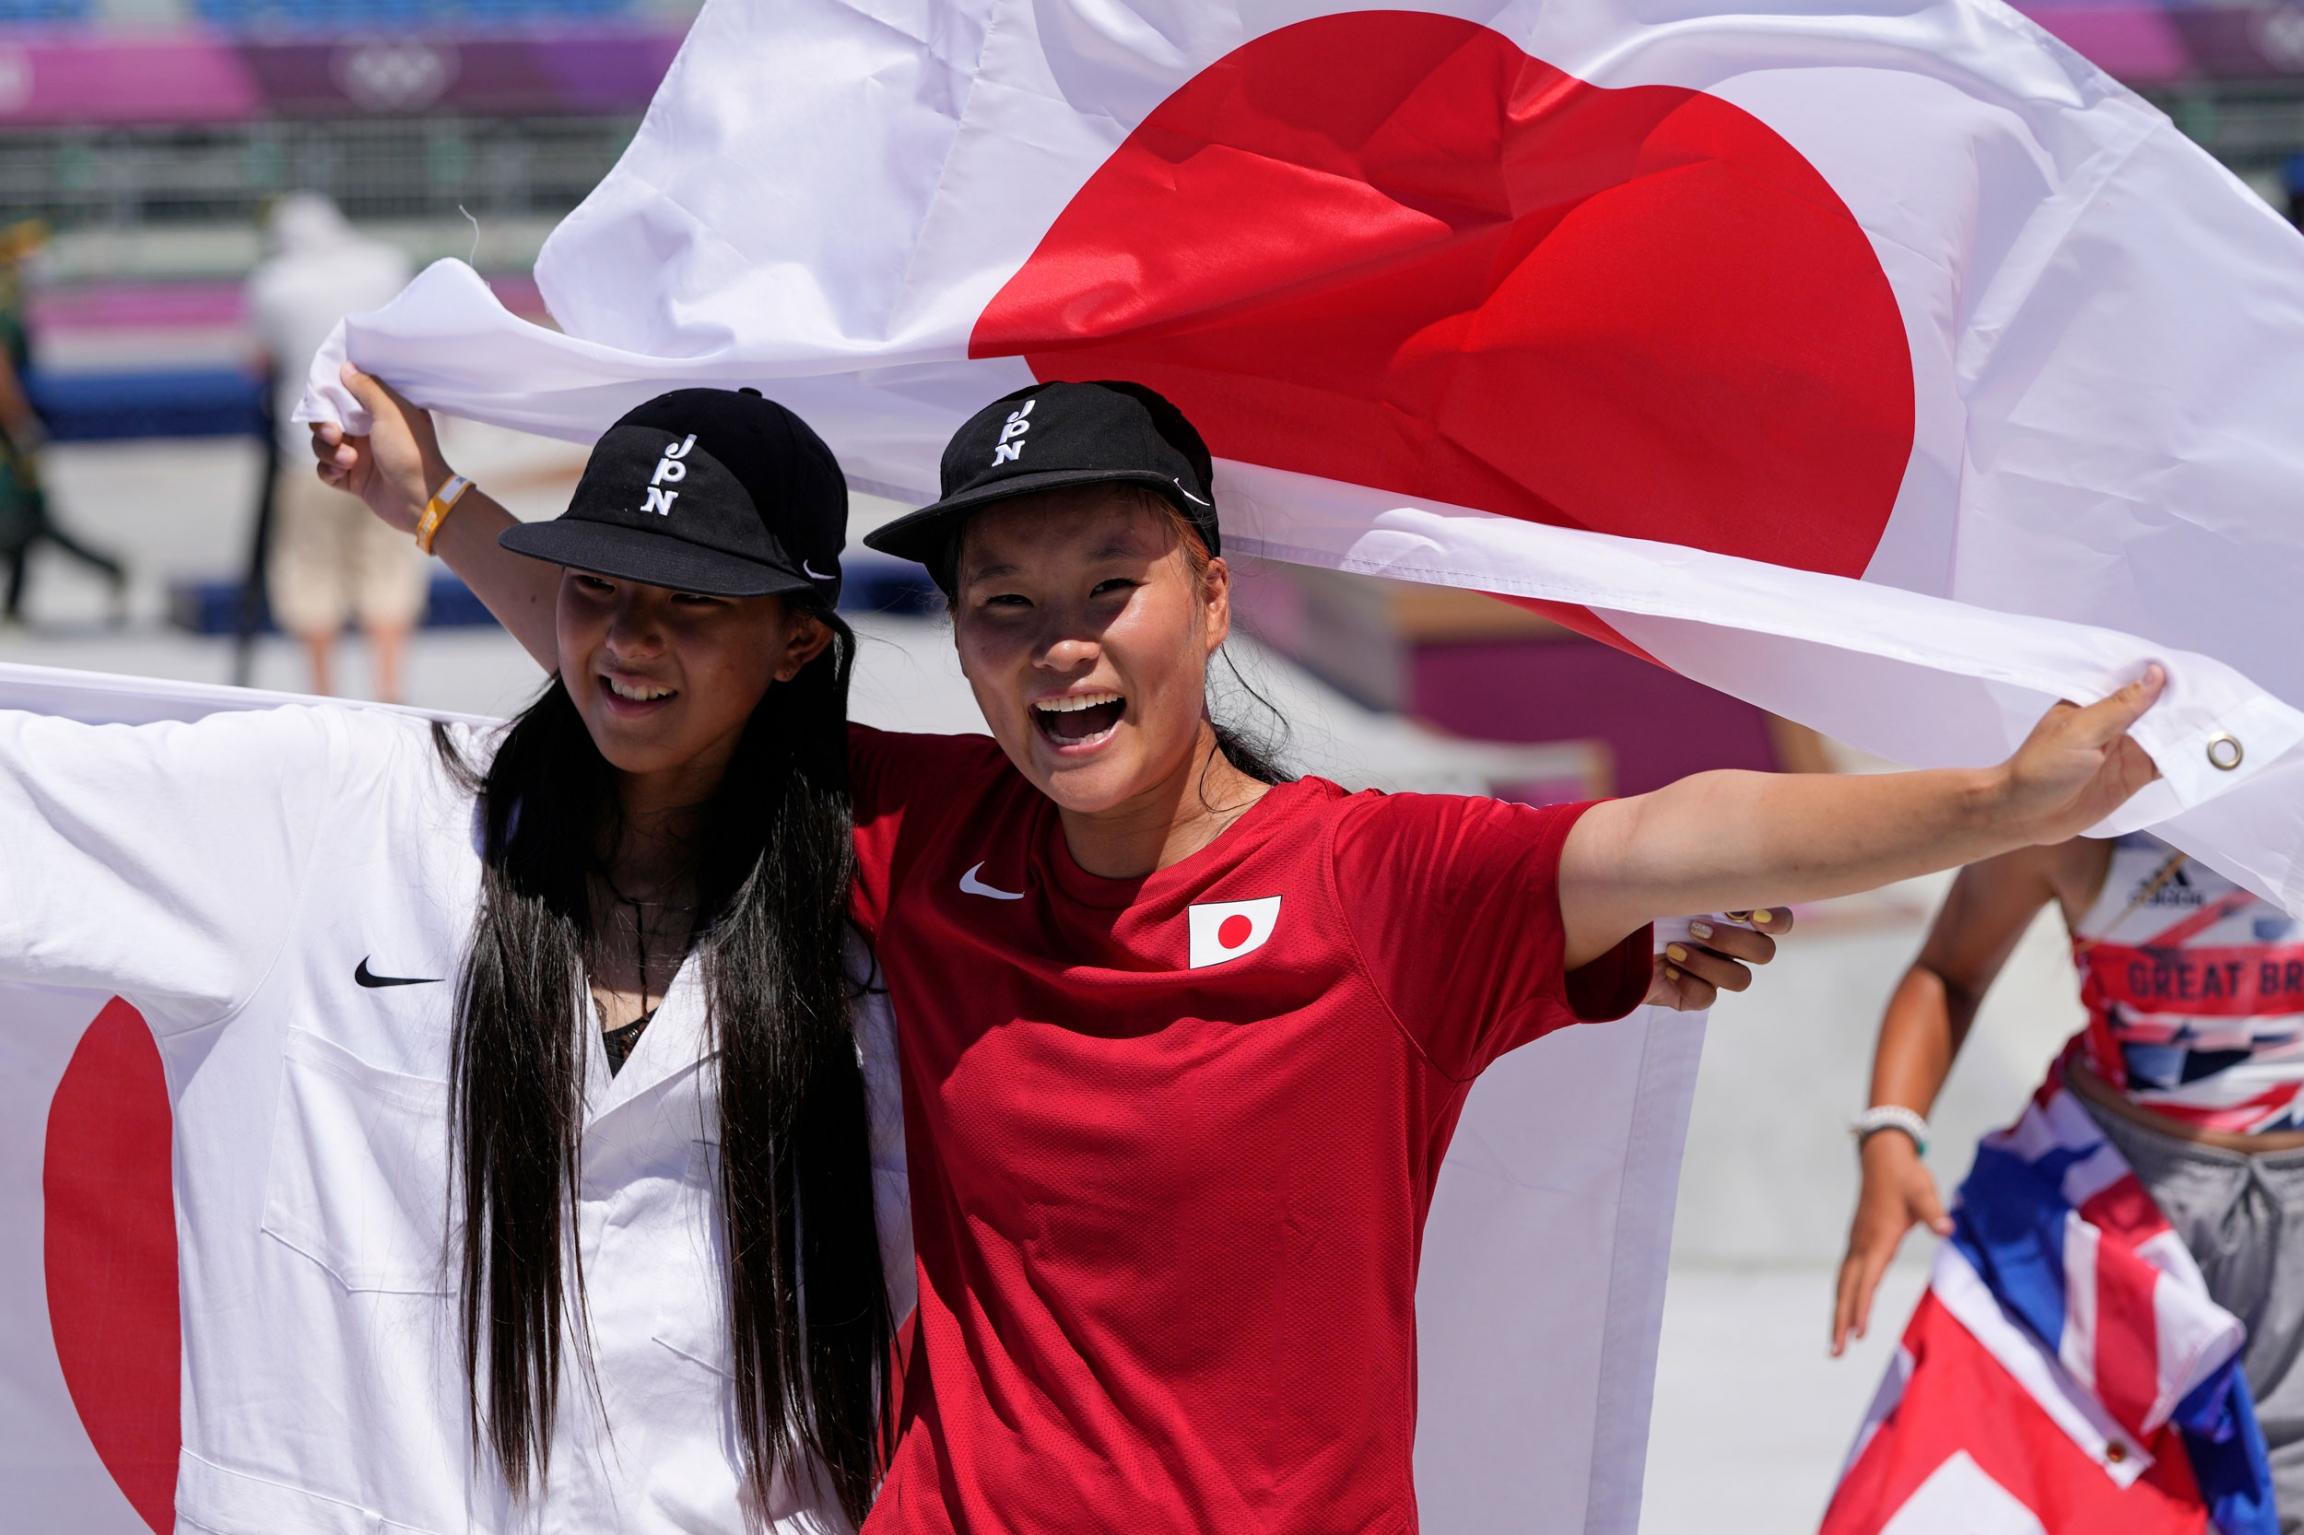 Sakura Yosozumi and Kokona Hiraki are show side-by-side with a Japanese flag held up behind them.